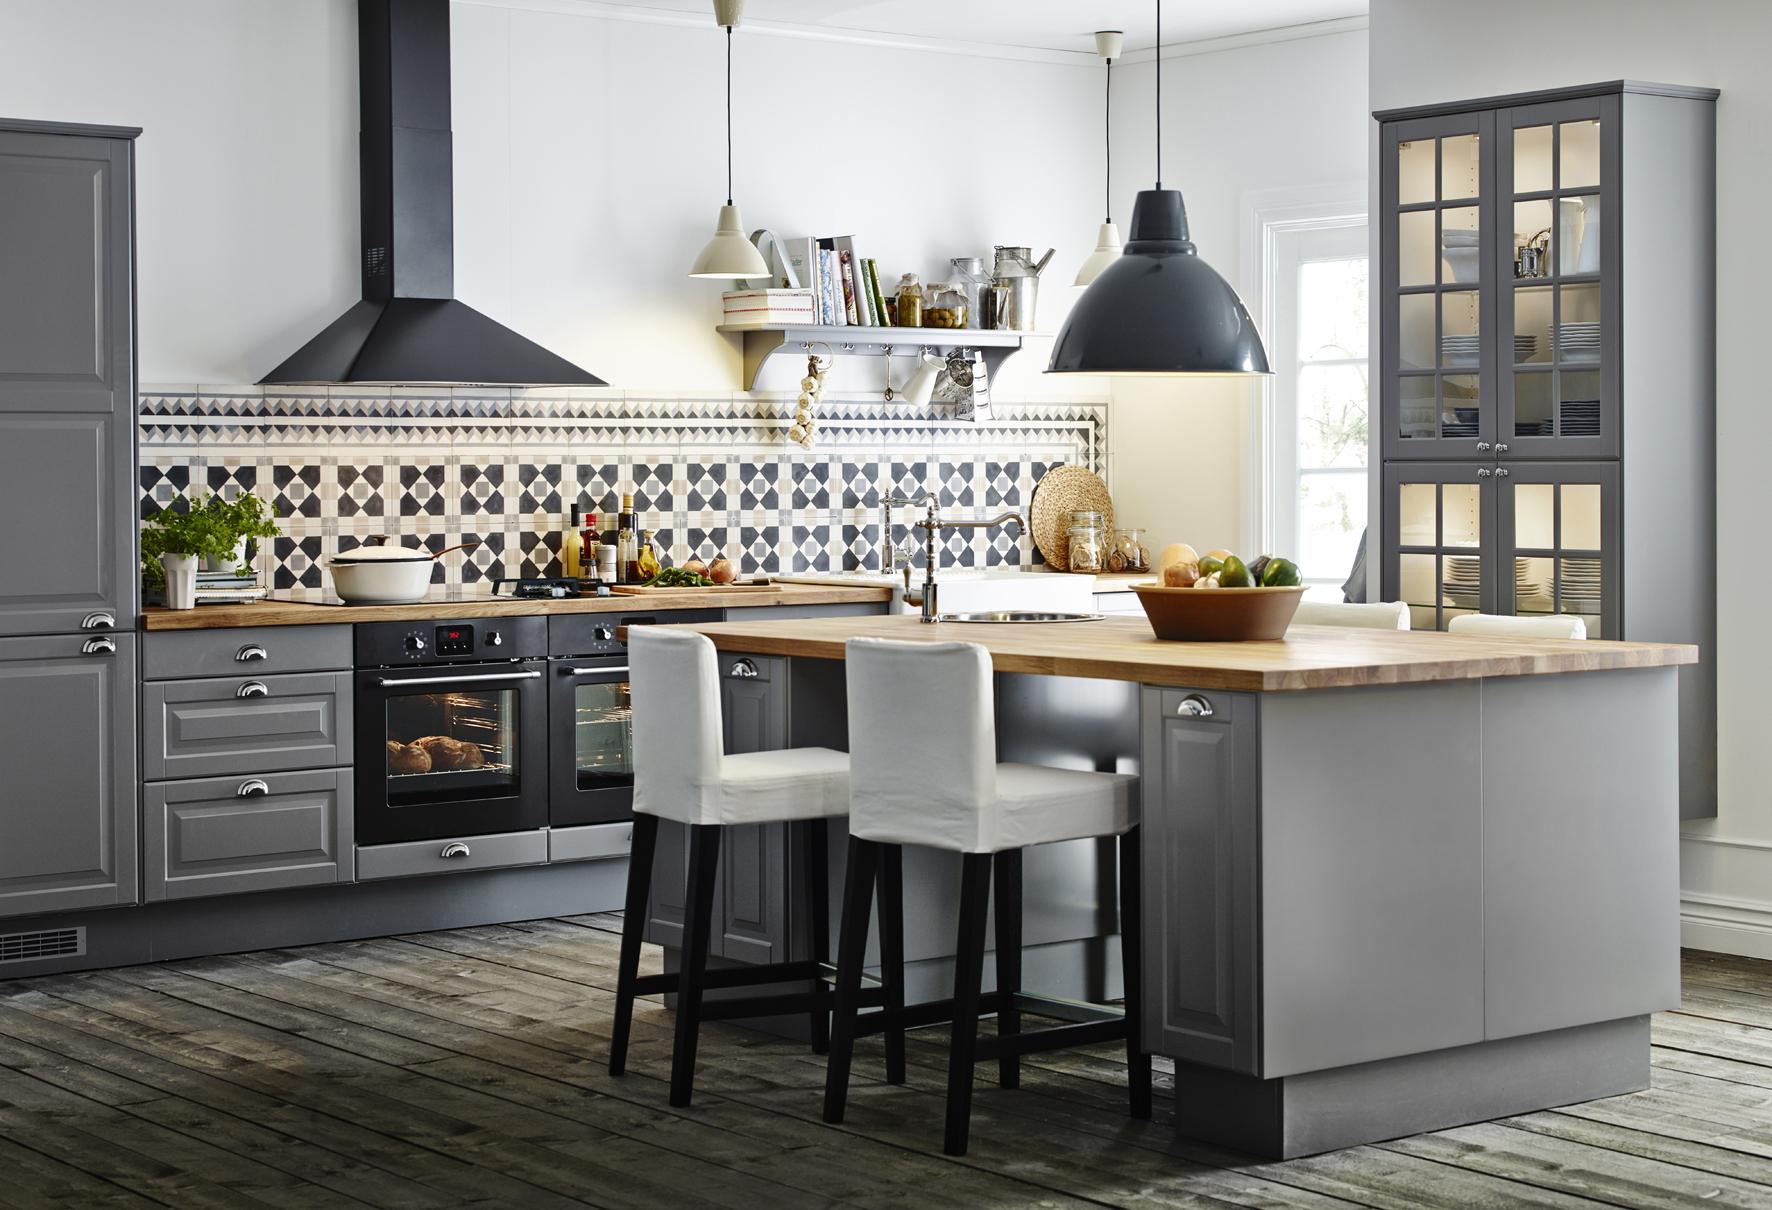 Keuken Ikea Moderne : Zelf een ikea keuken plaatsen thomas gaspersz